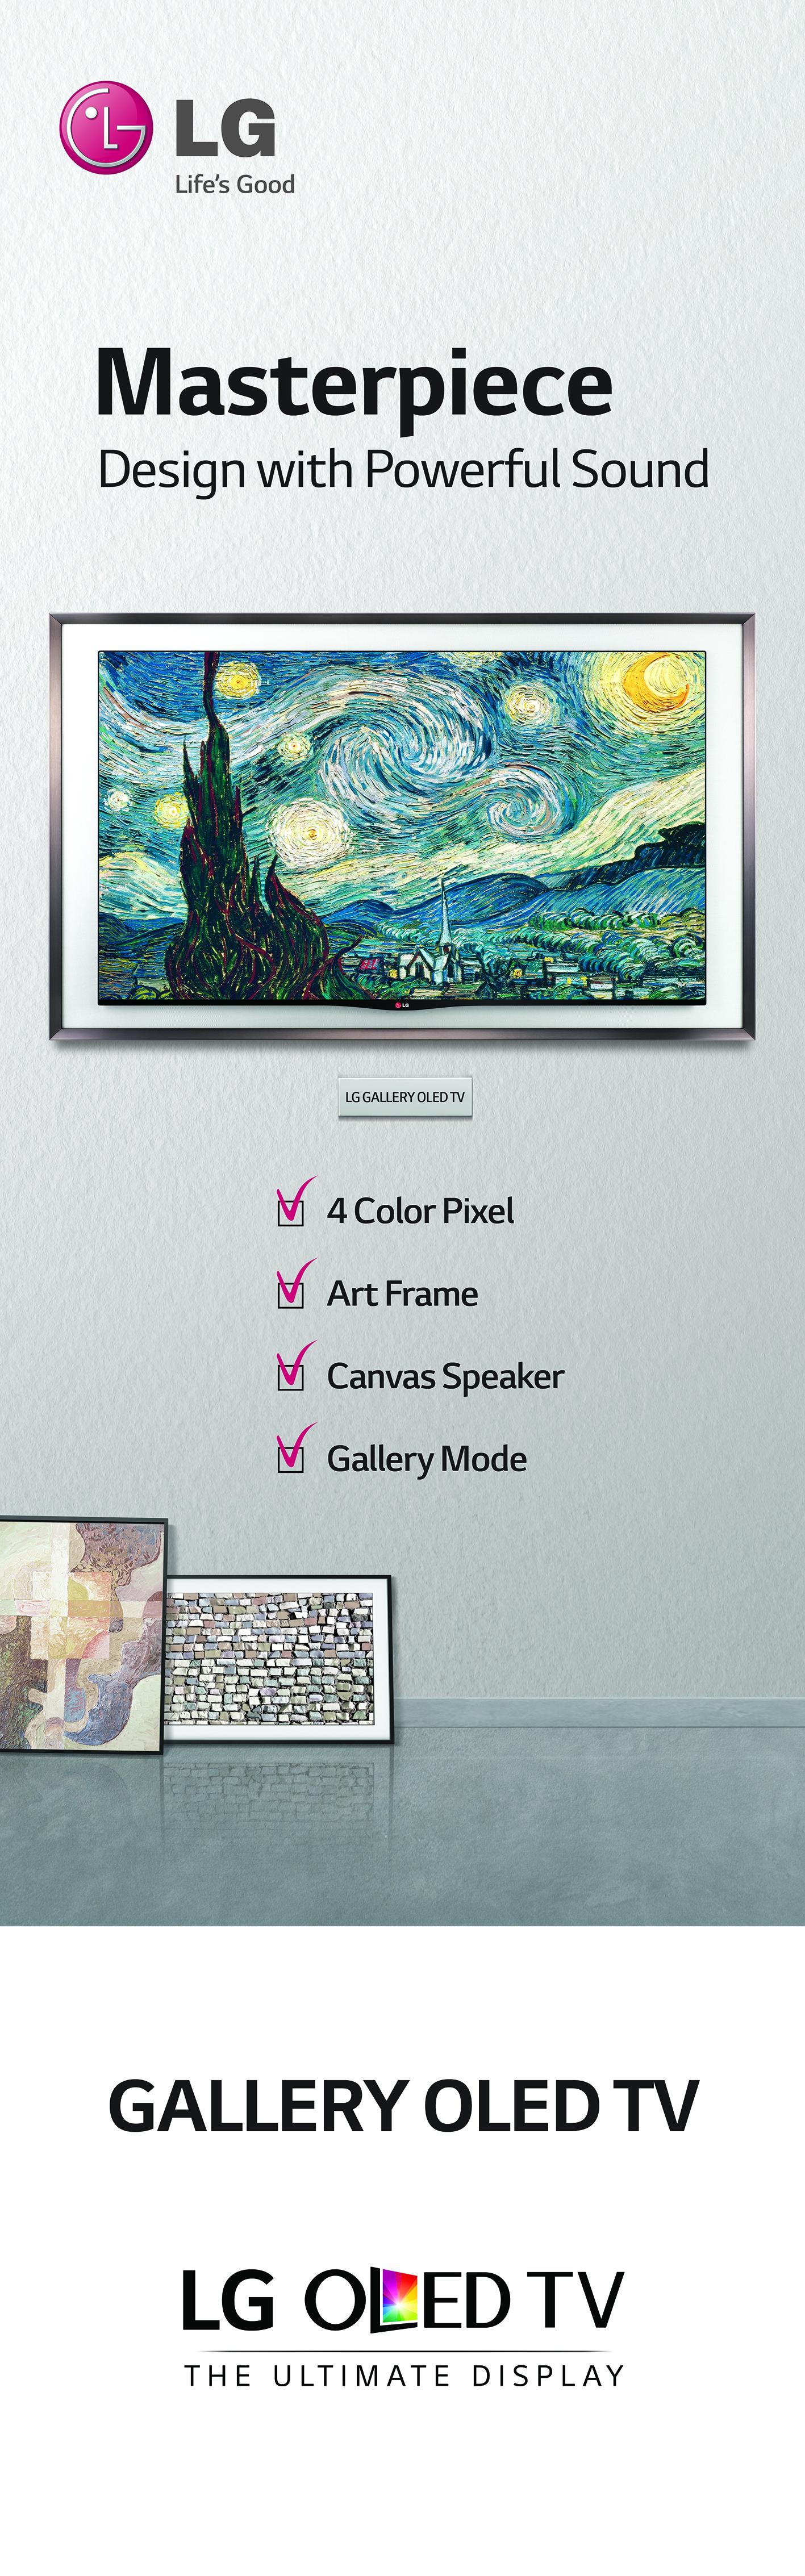 LG Gallery TV